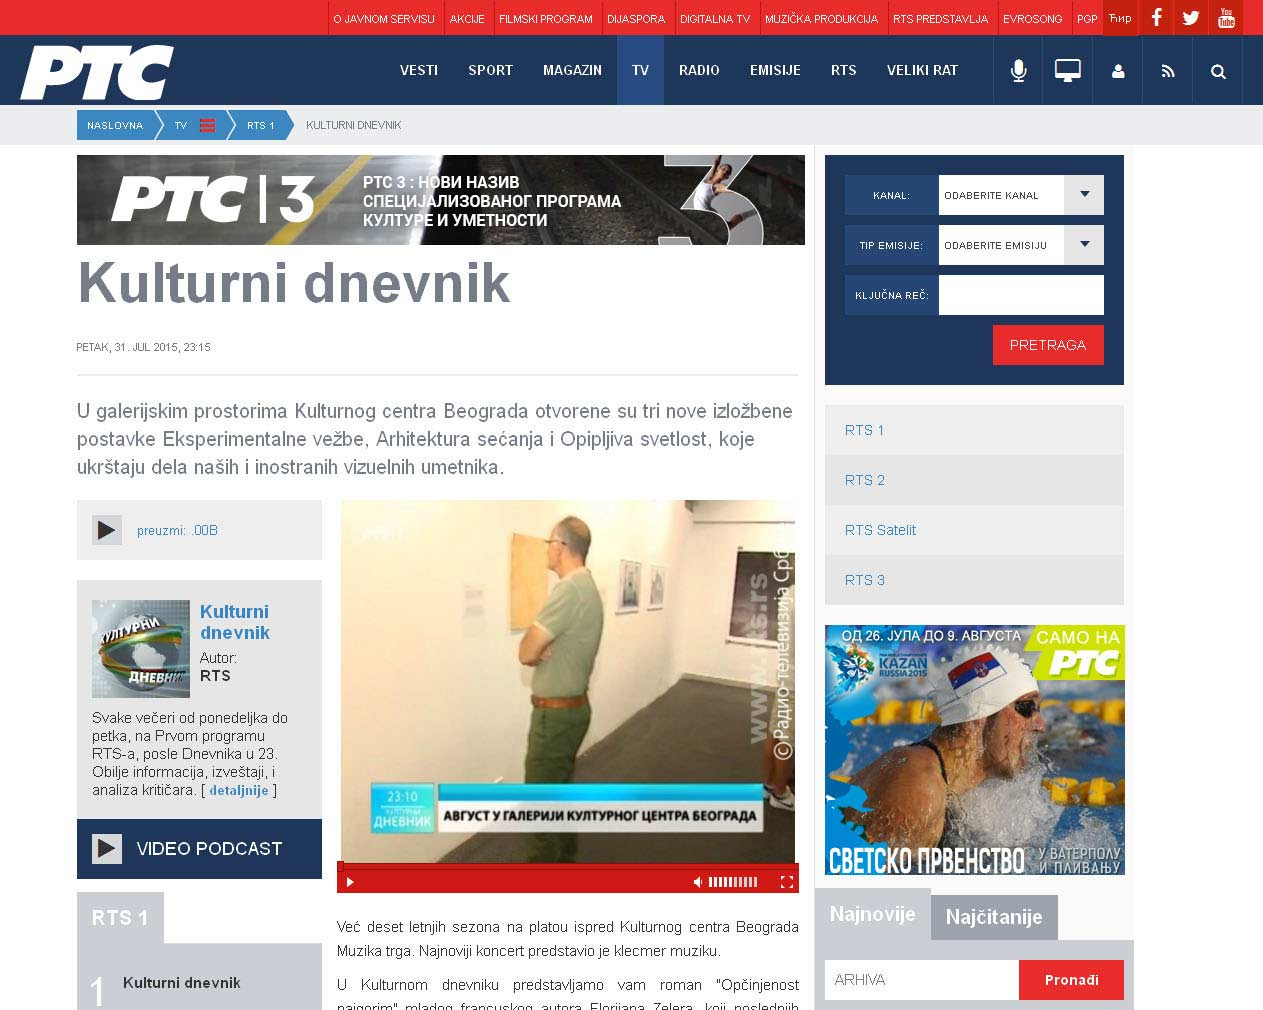 3107---rts.rs---Kulturni-dnevnik